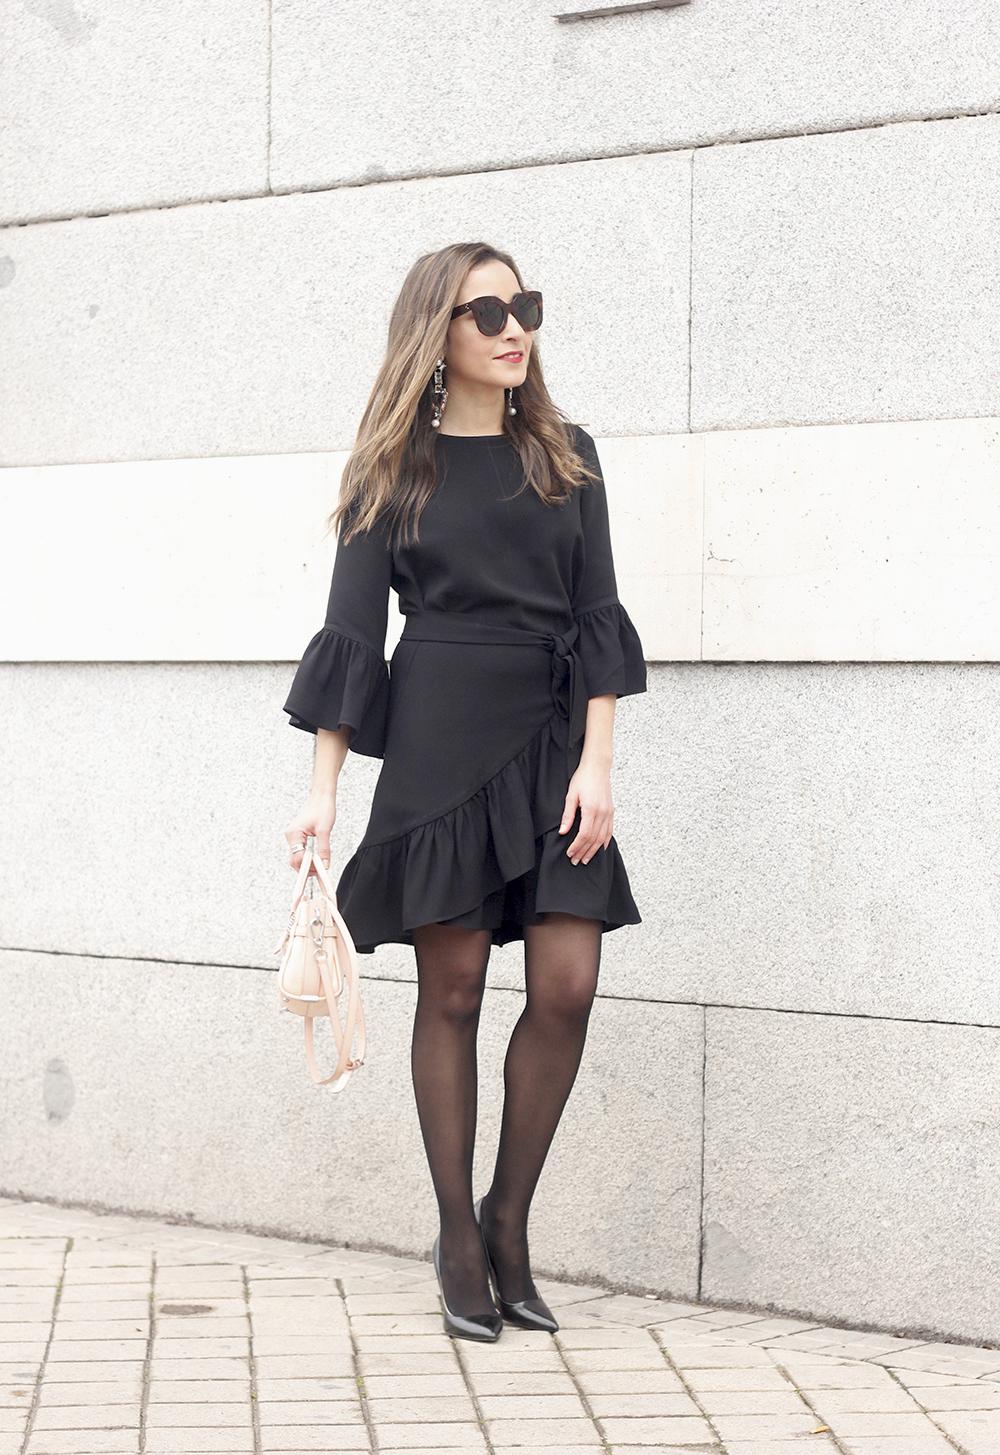 big earrings uterqüe black dress ruffles black heels style fashion outfit winter01